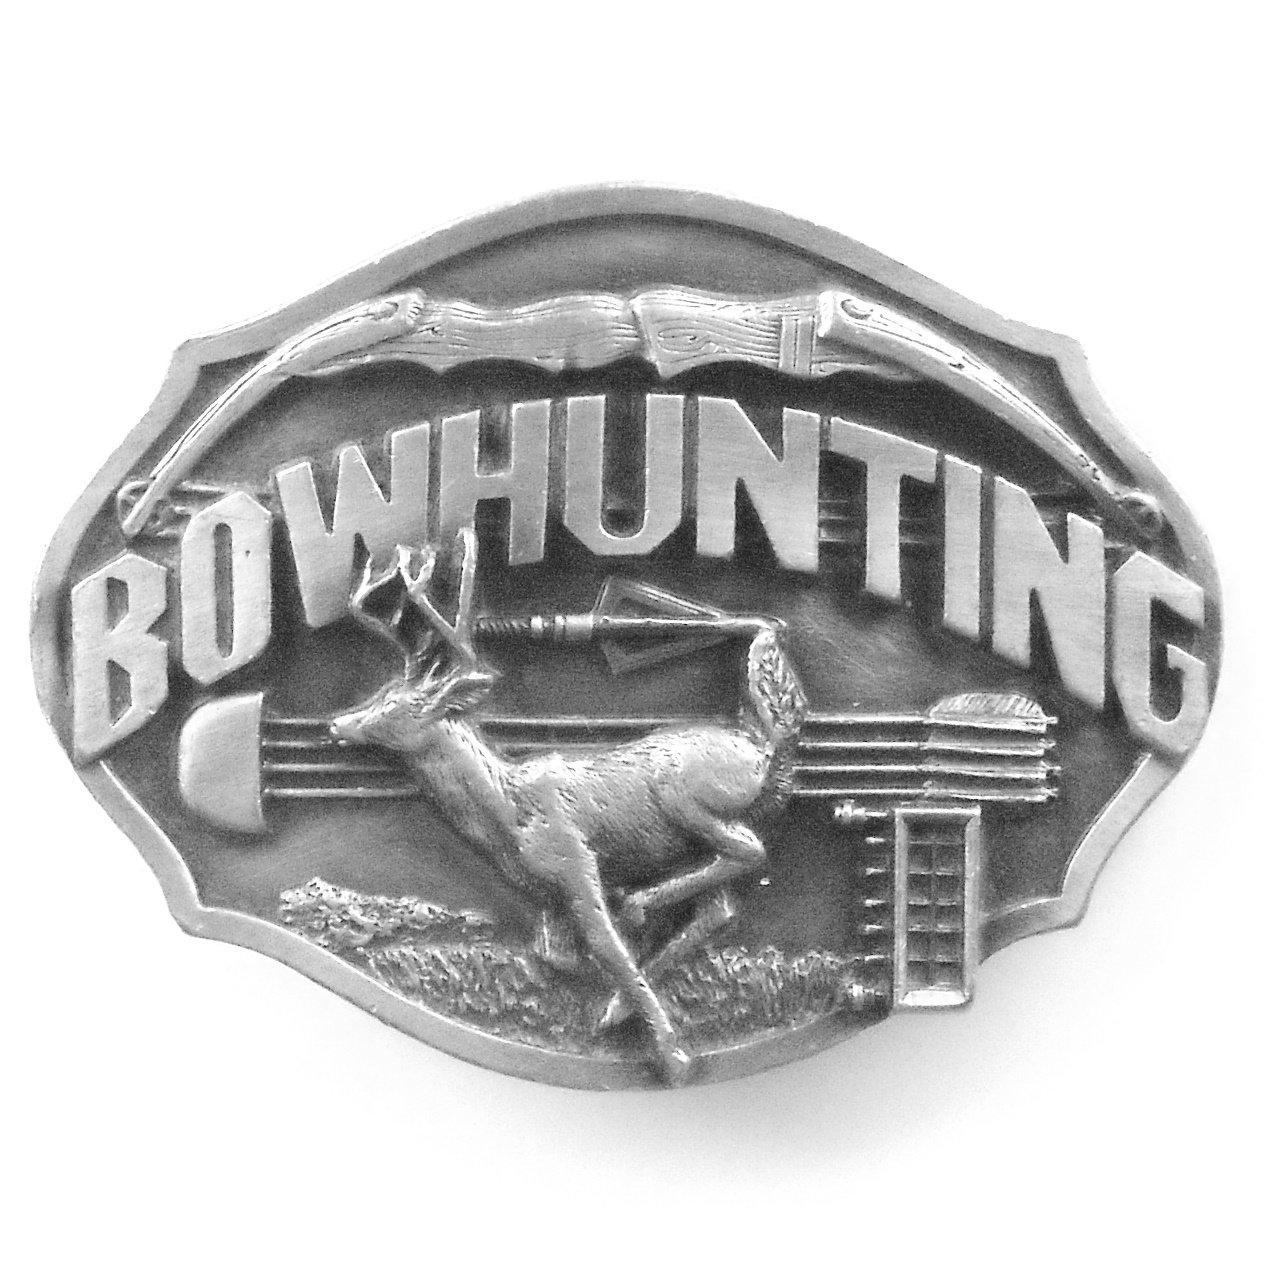 Bow Hunting pewter Siskiyou 3D belt buckle